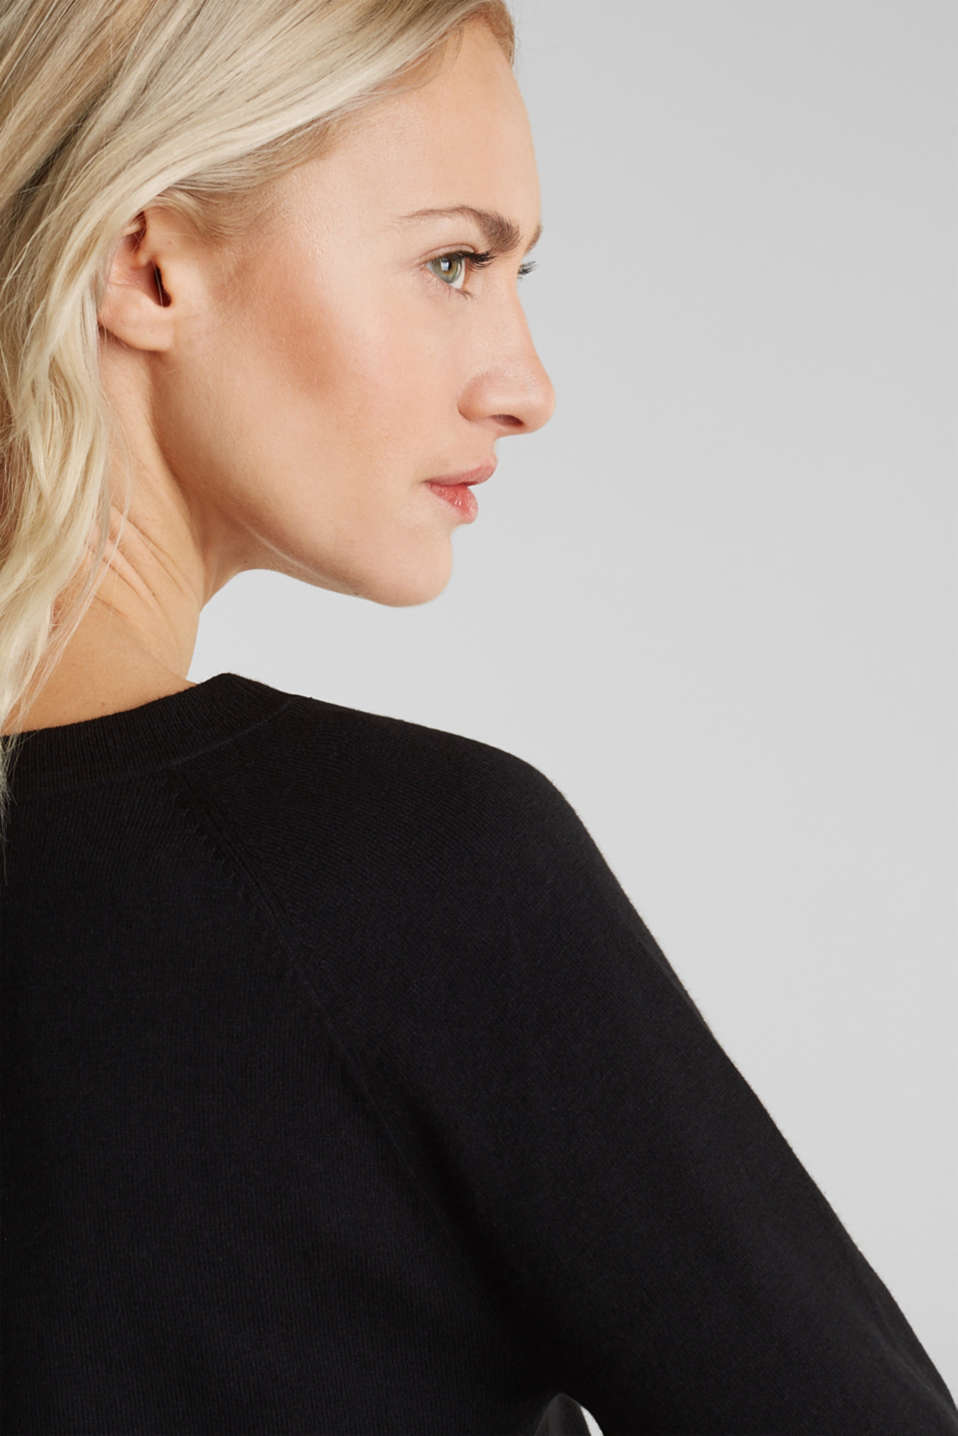 With linen: Jumper with open-work patterned details, BLACK, detail image number 4